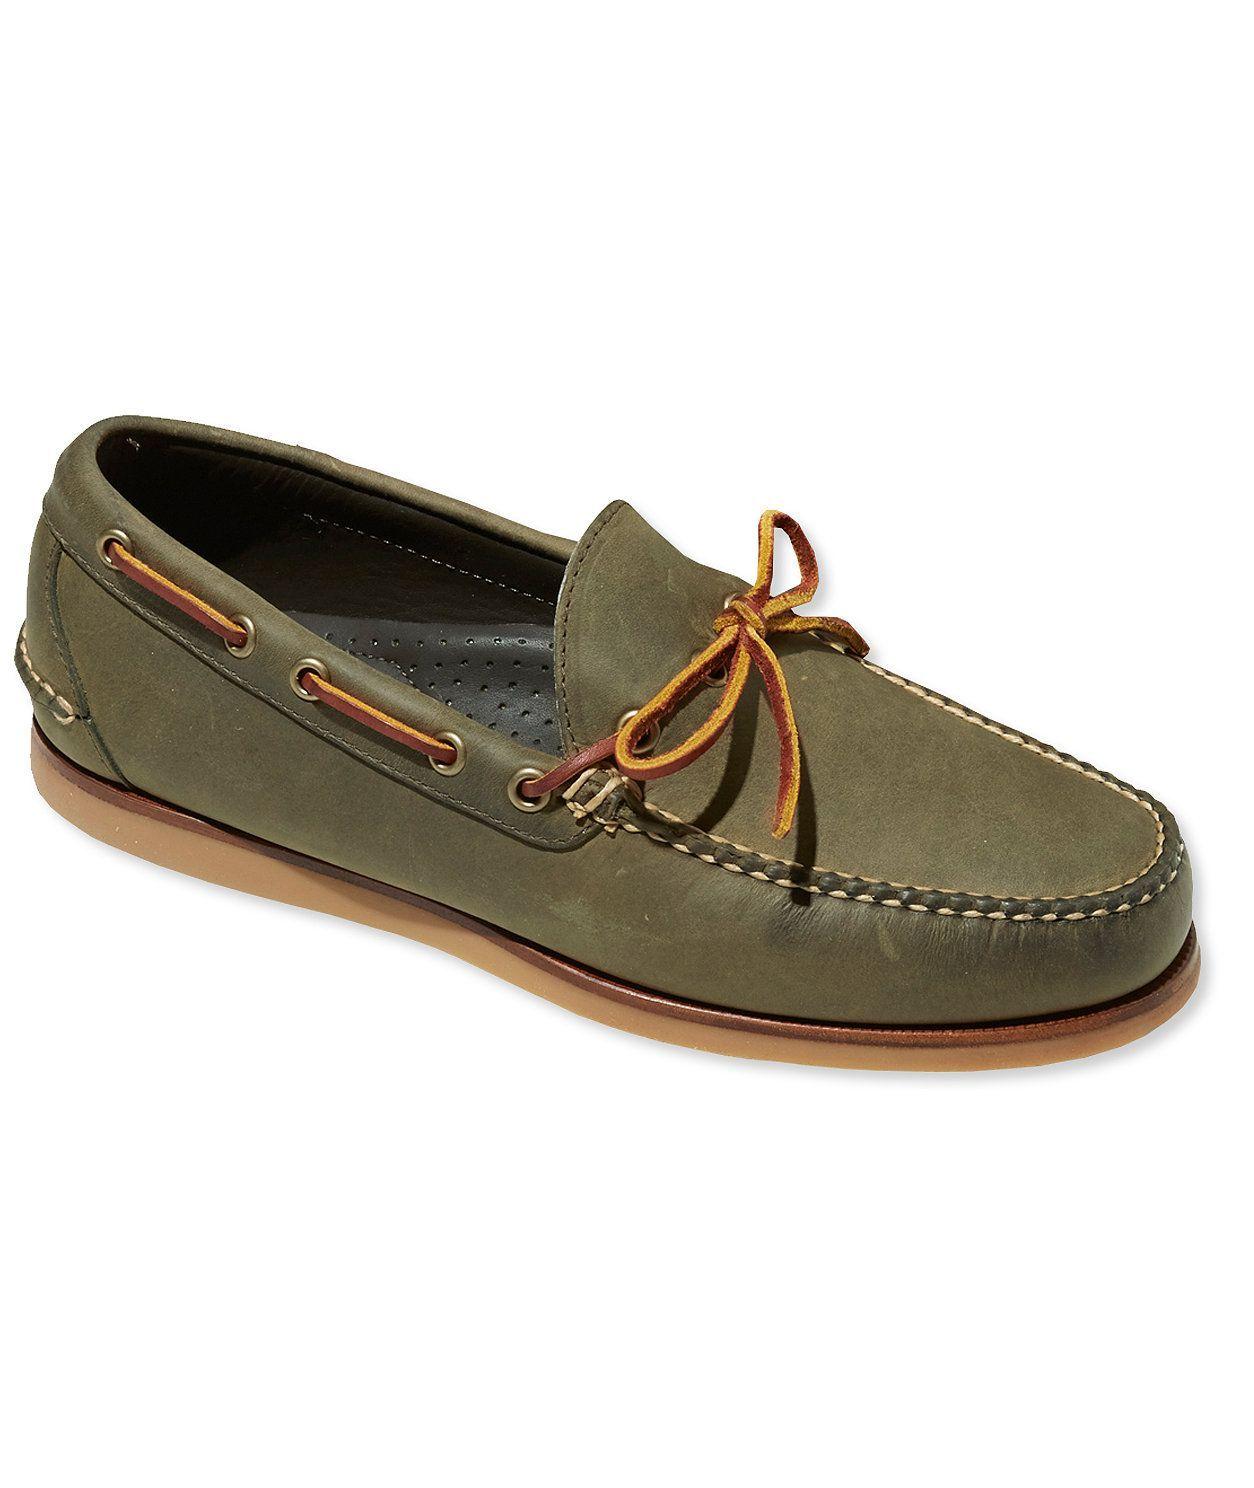 5654184ac41 Men's Signature Handsewn Jackman Camp Mocs | Products | Shoes, Boat ...